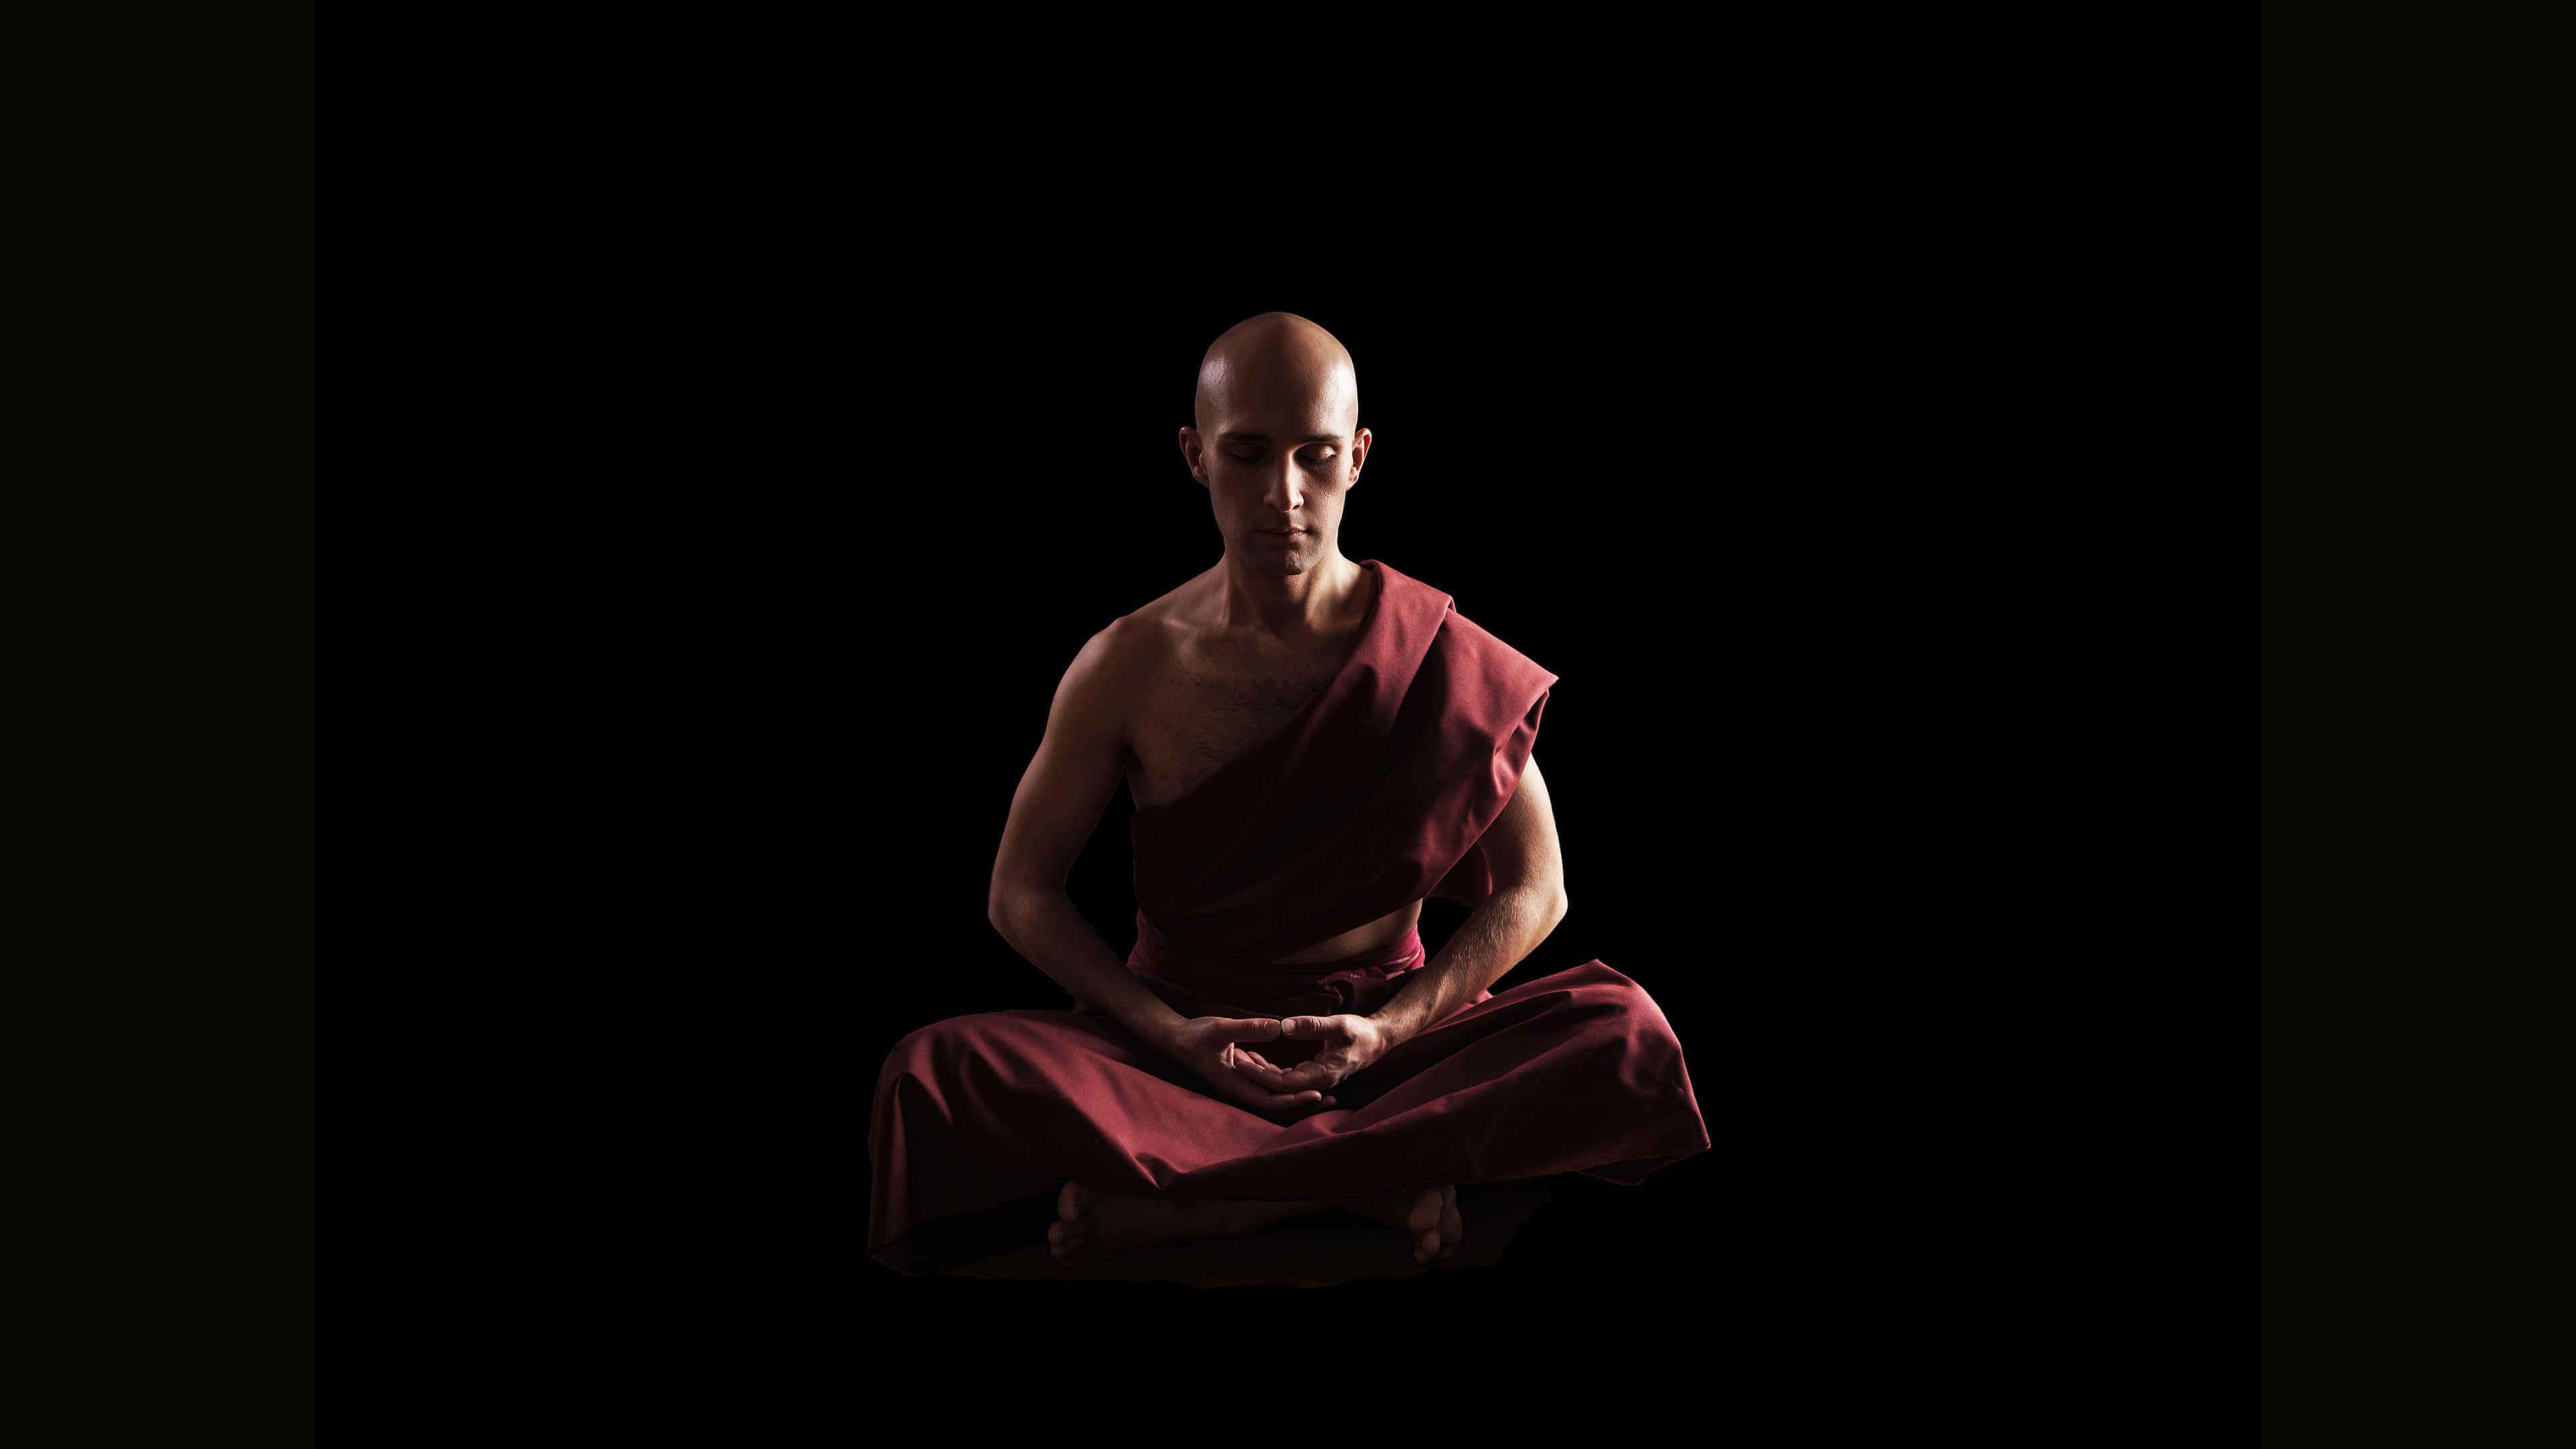 buddhist monk meditating uhd 4k wallpaper